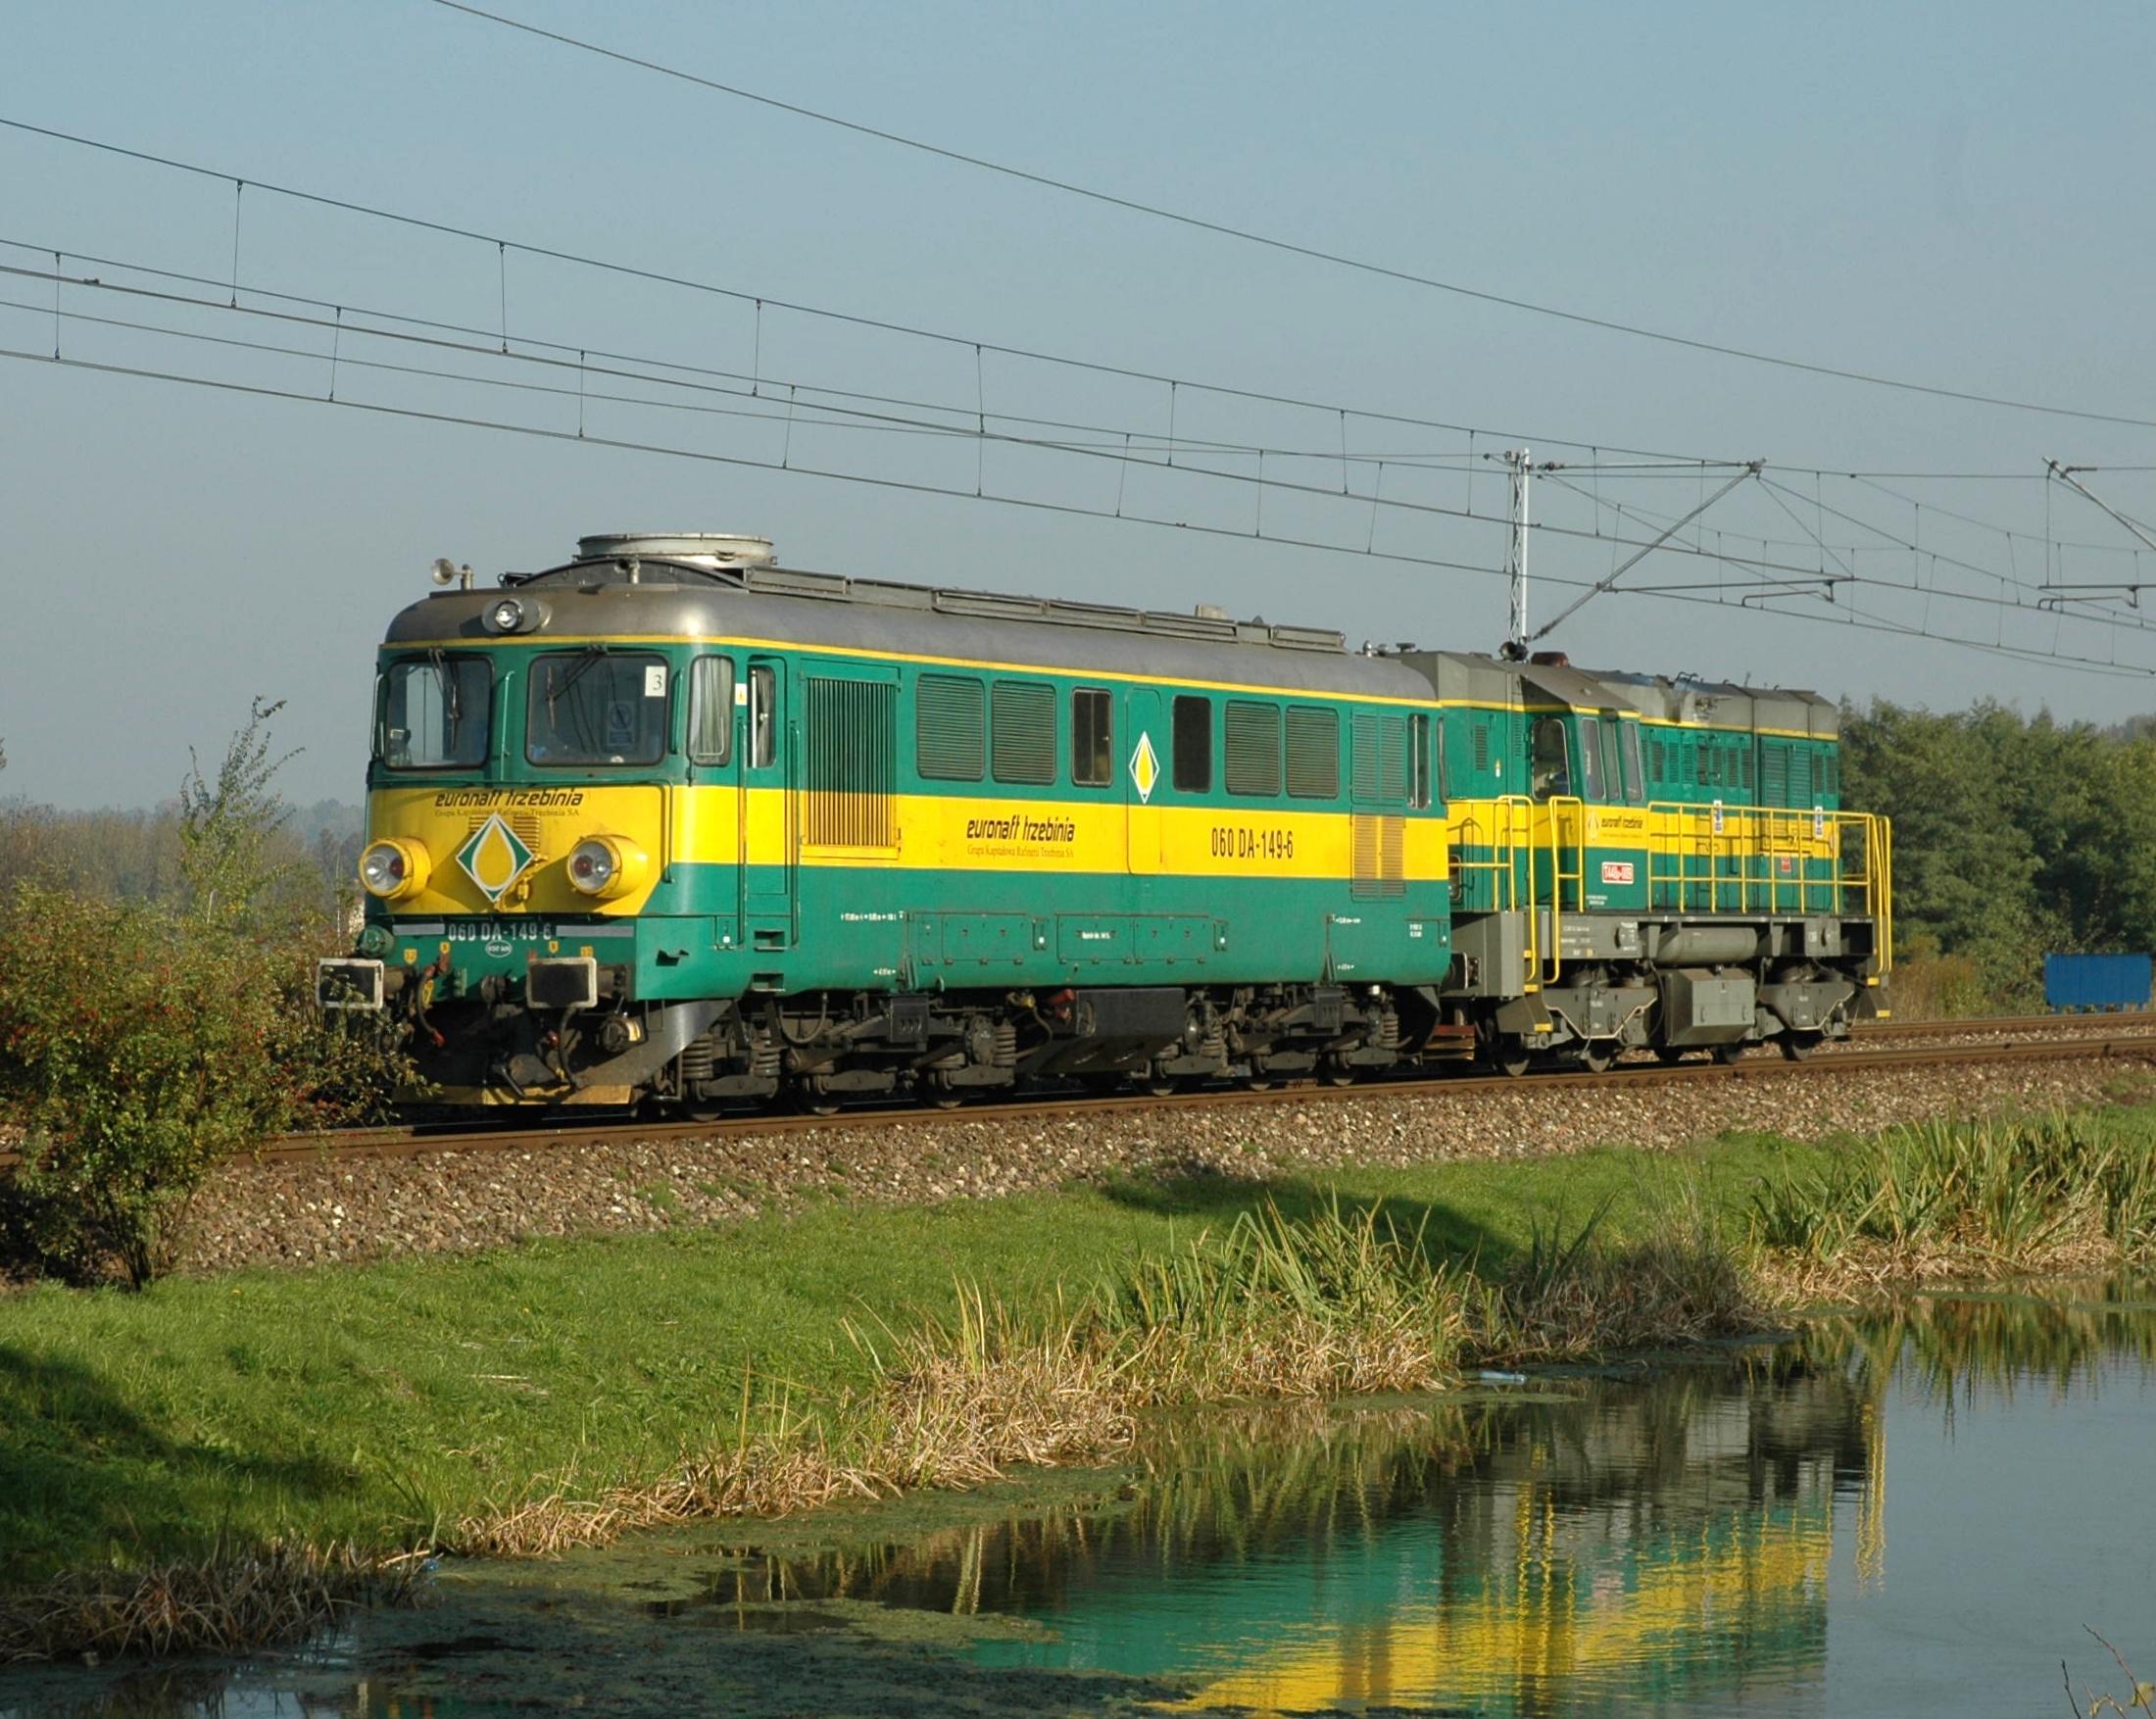 File:060DA-1496 T448p-009 ENTR Petrovice u Karvine - Zebrzydowice.jpg